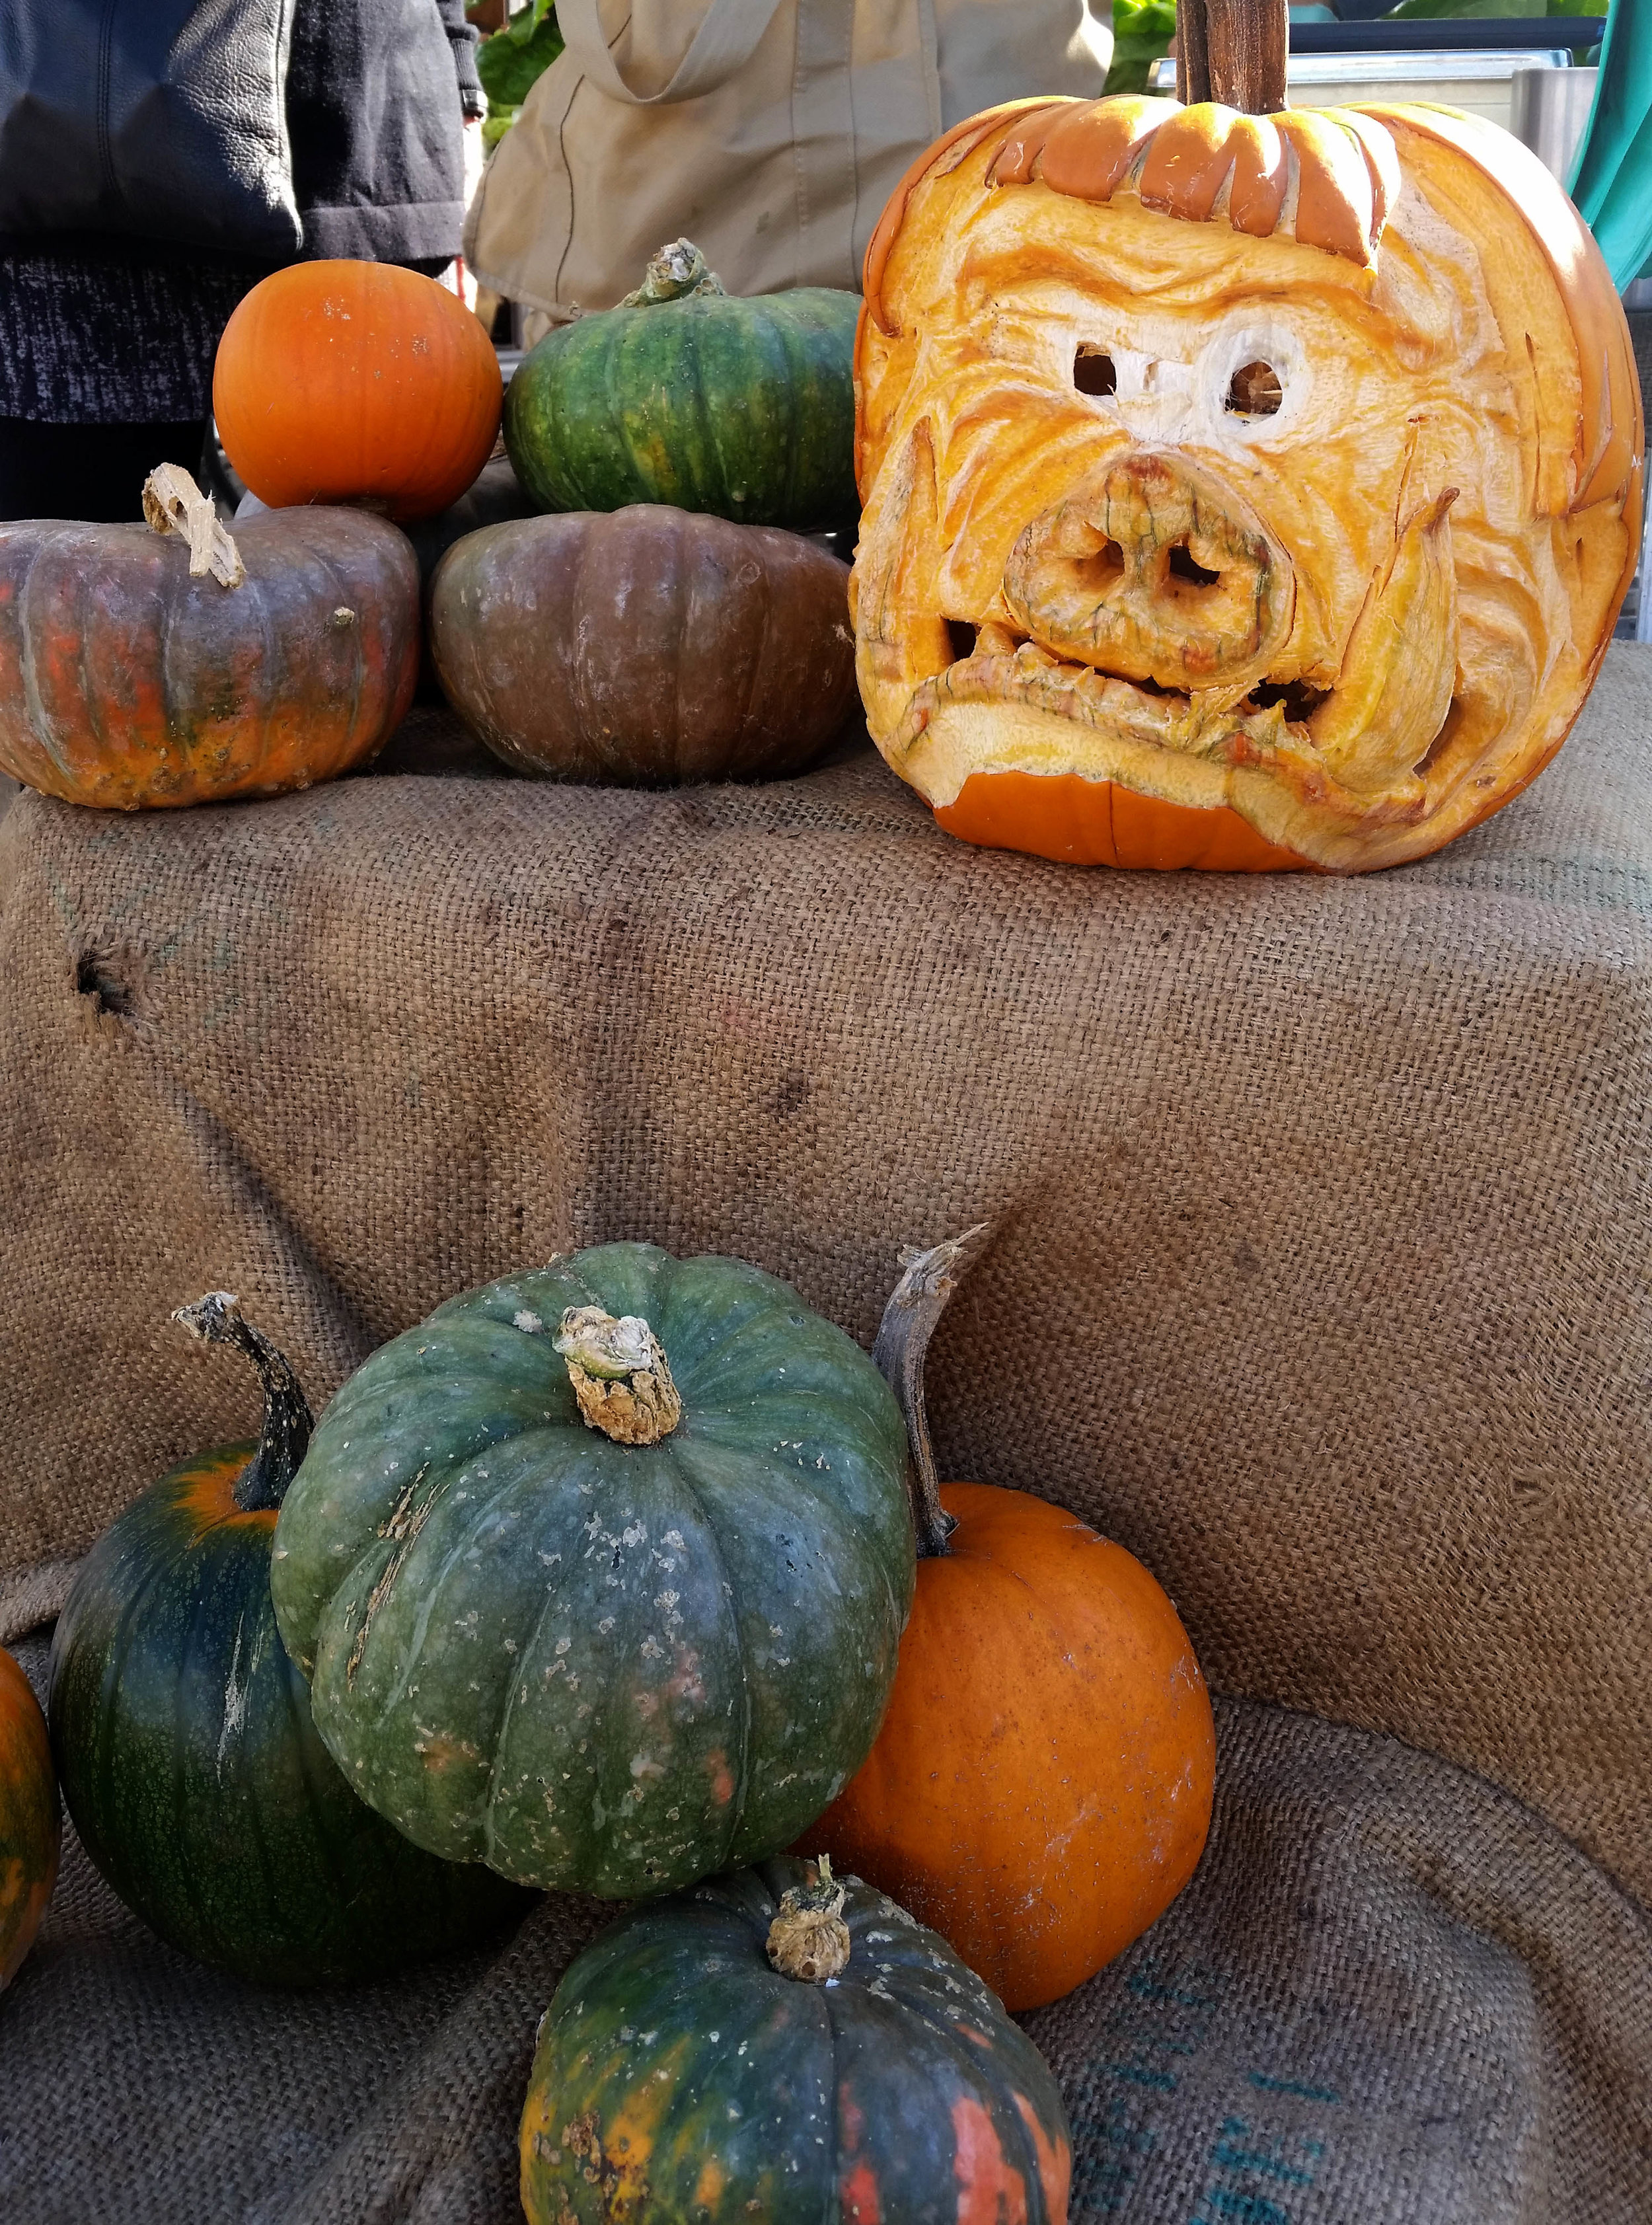 Harvest season at the market